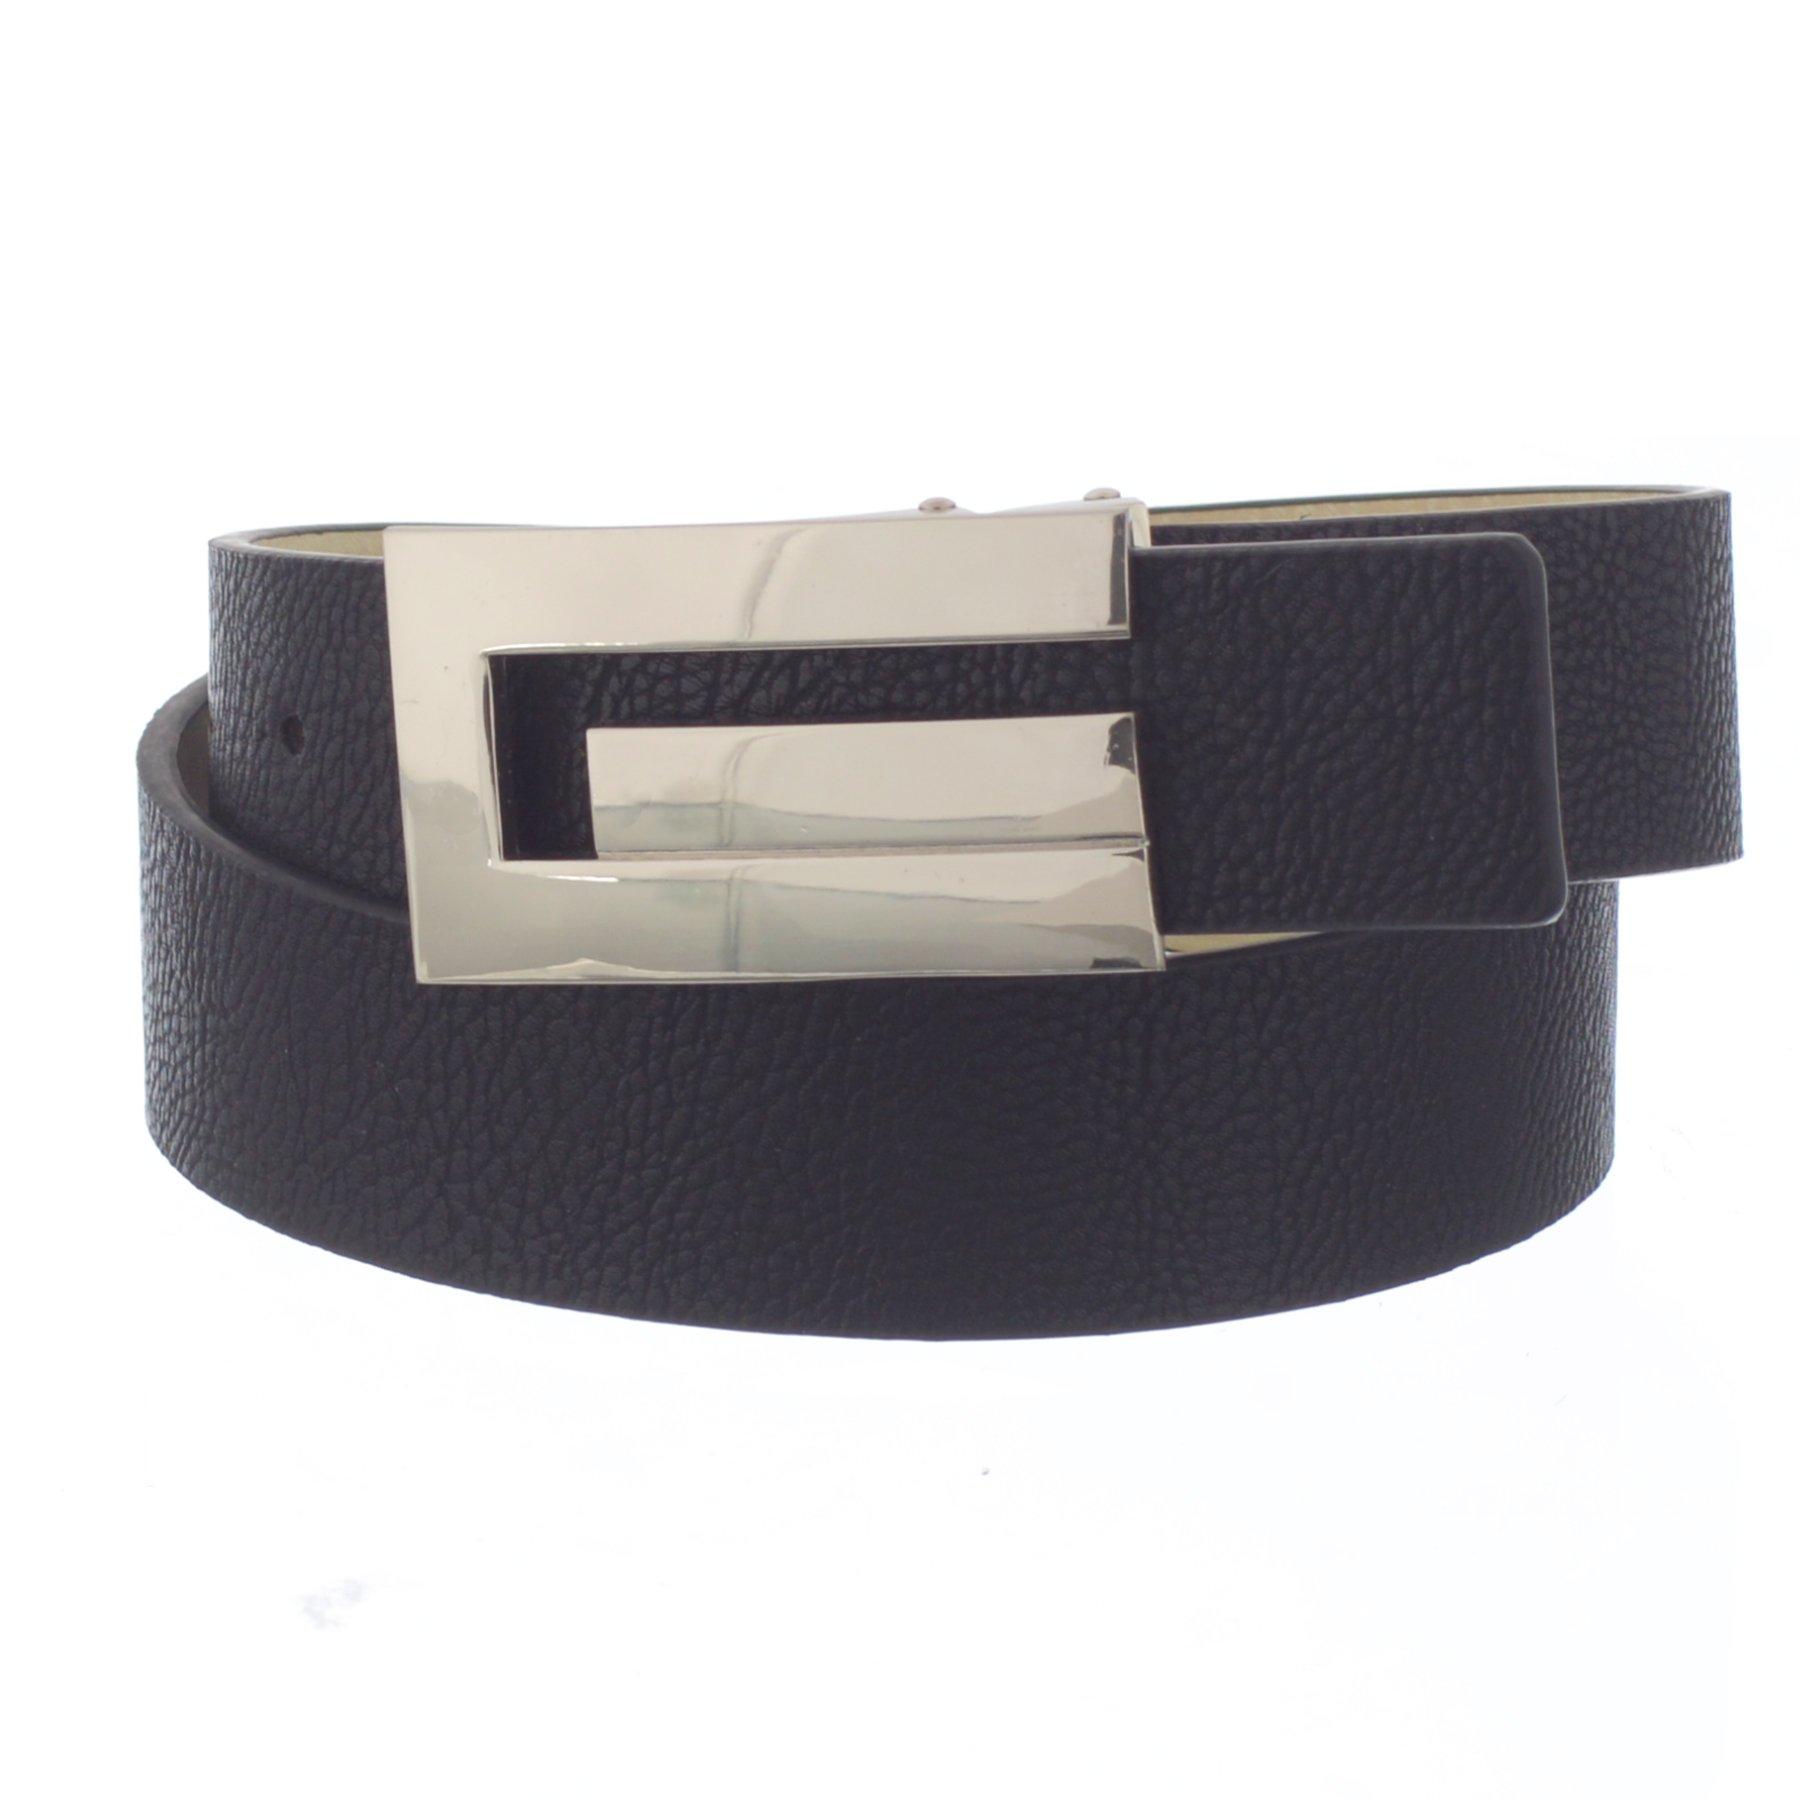 Xcessoire Boys School Uniform Belt with G styled Buckle (Black, 14)